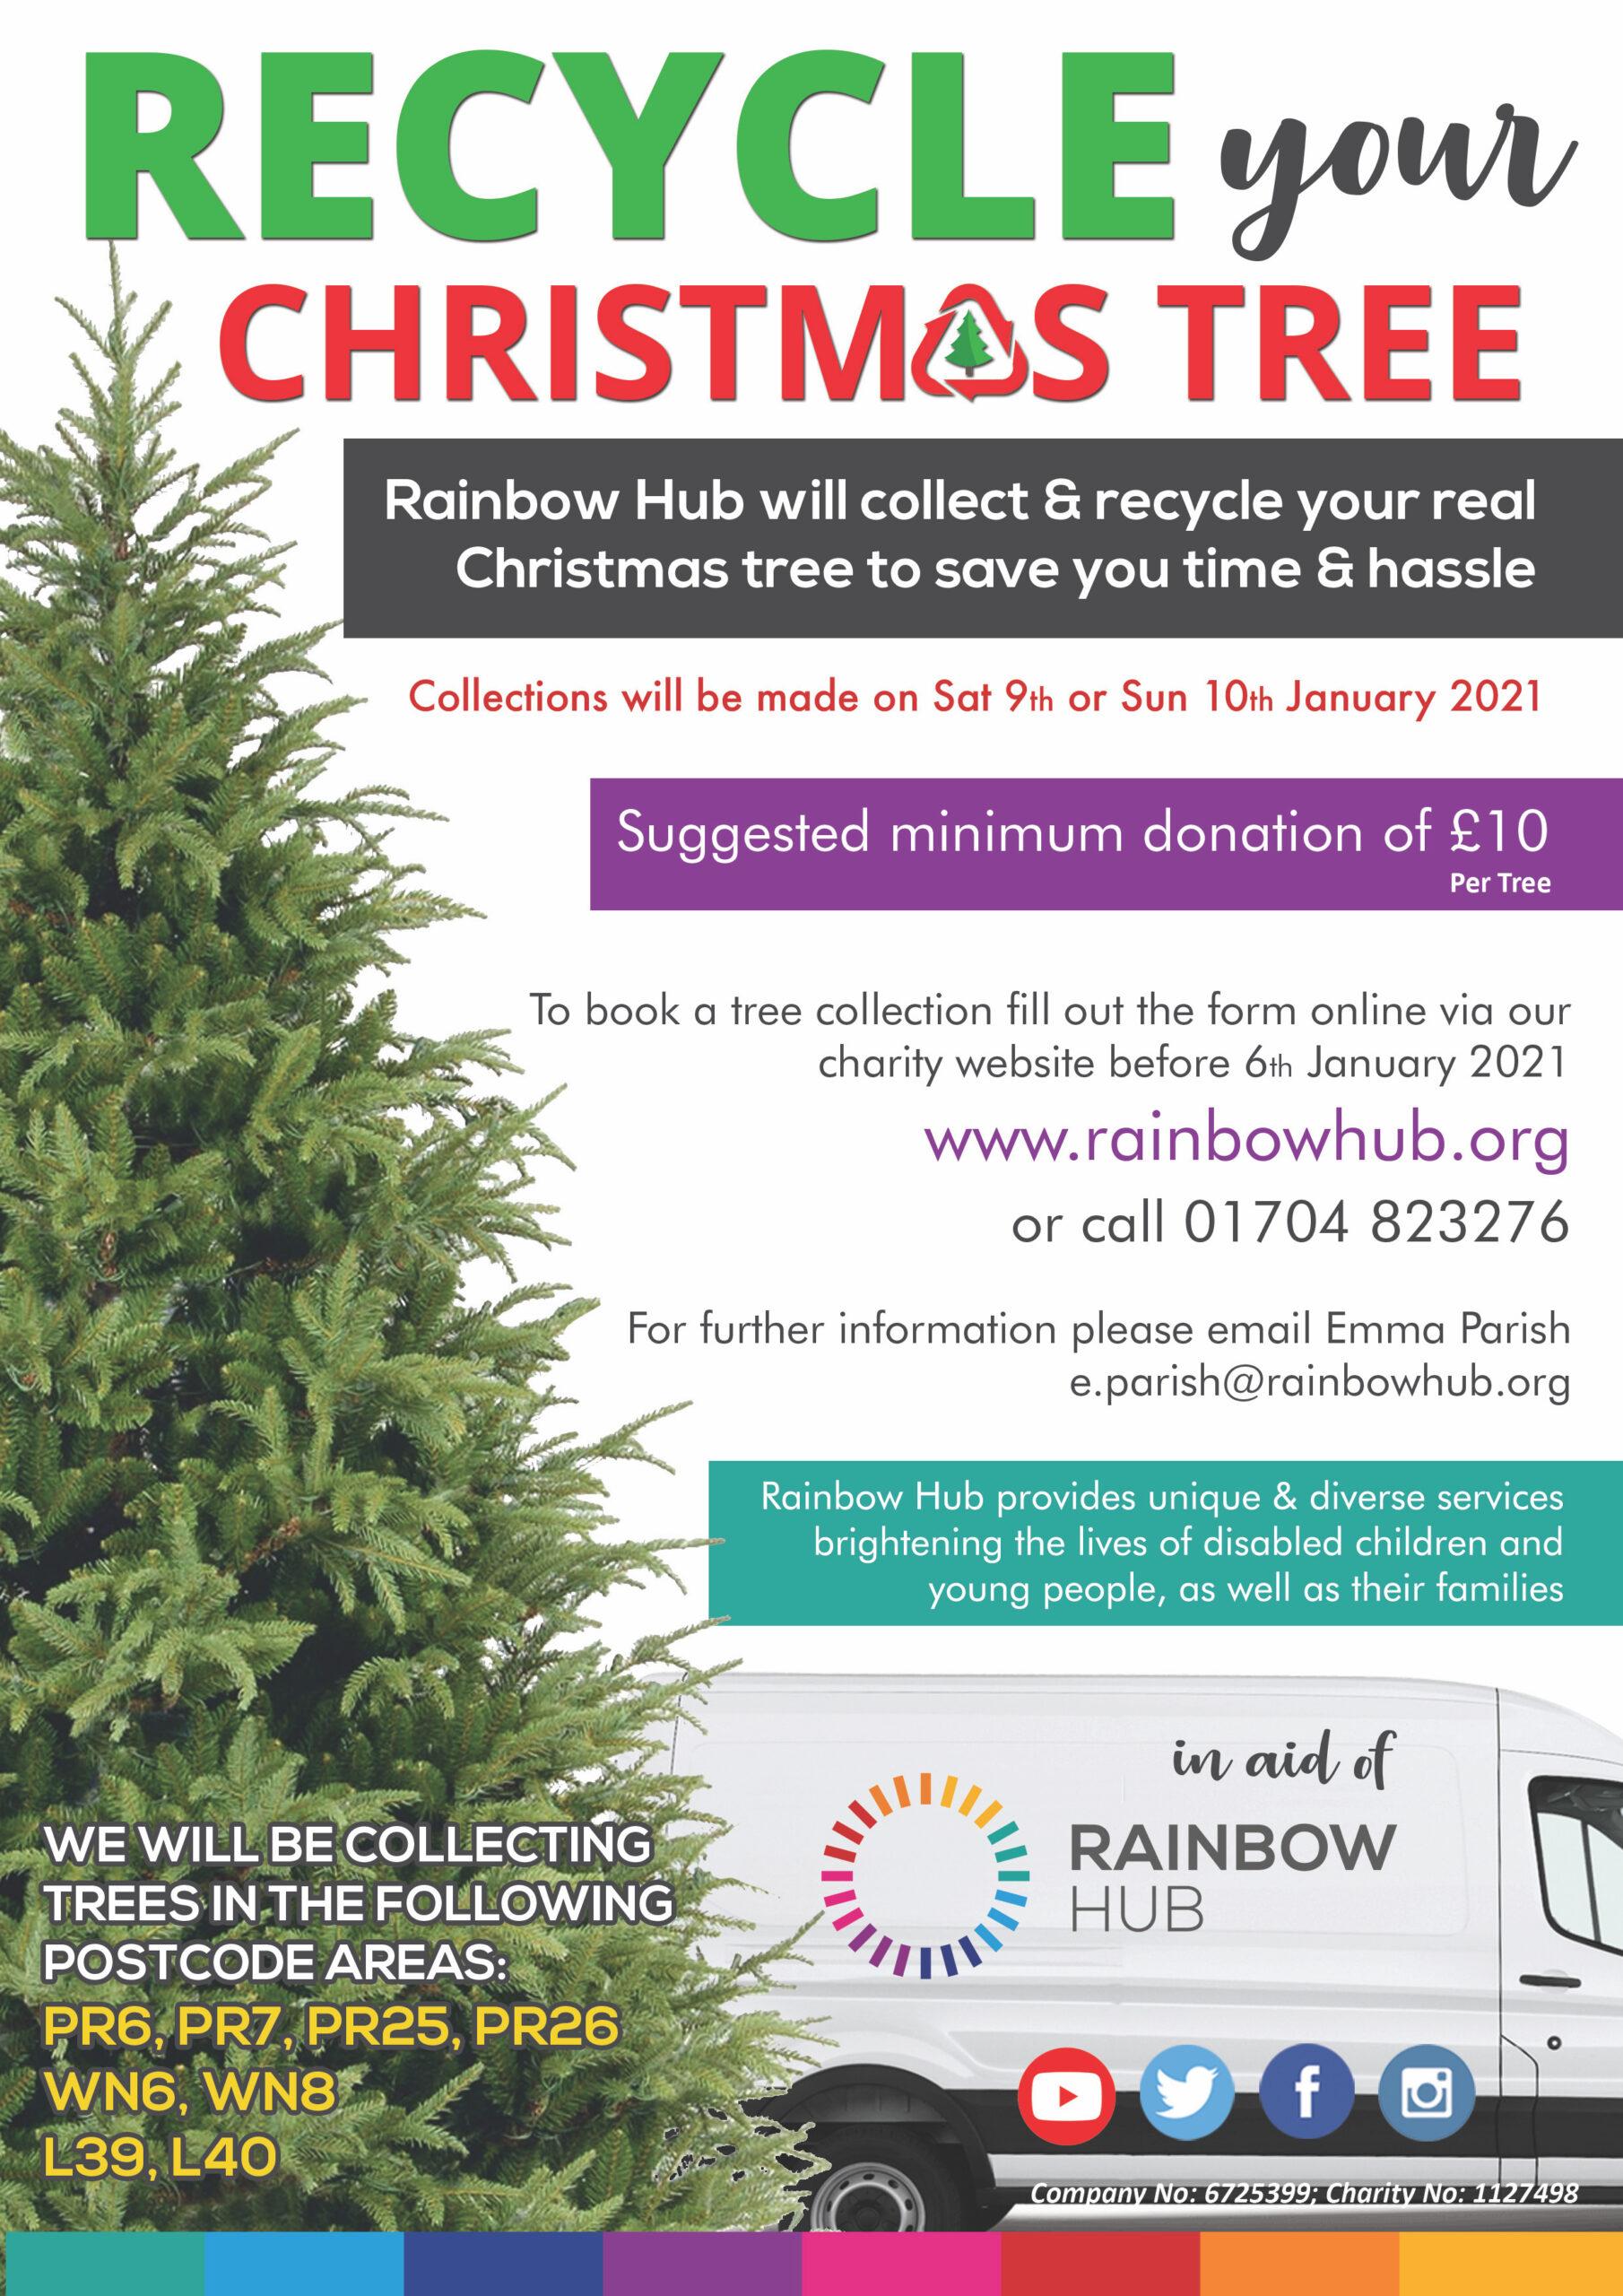 The Rainbow Hub Christmas tree collection fund raiser